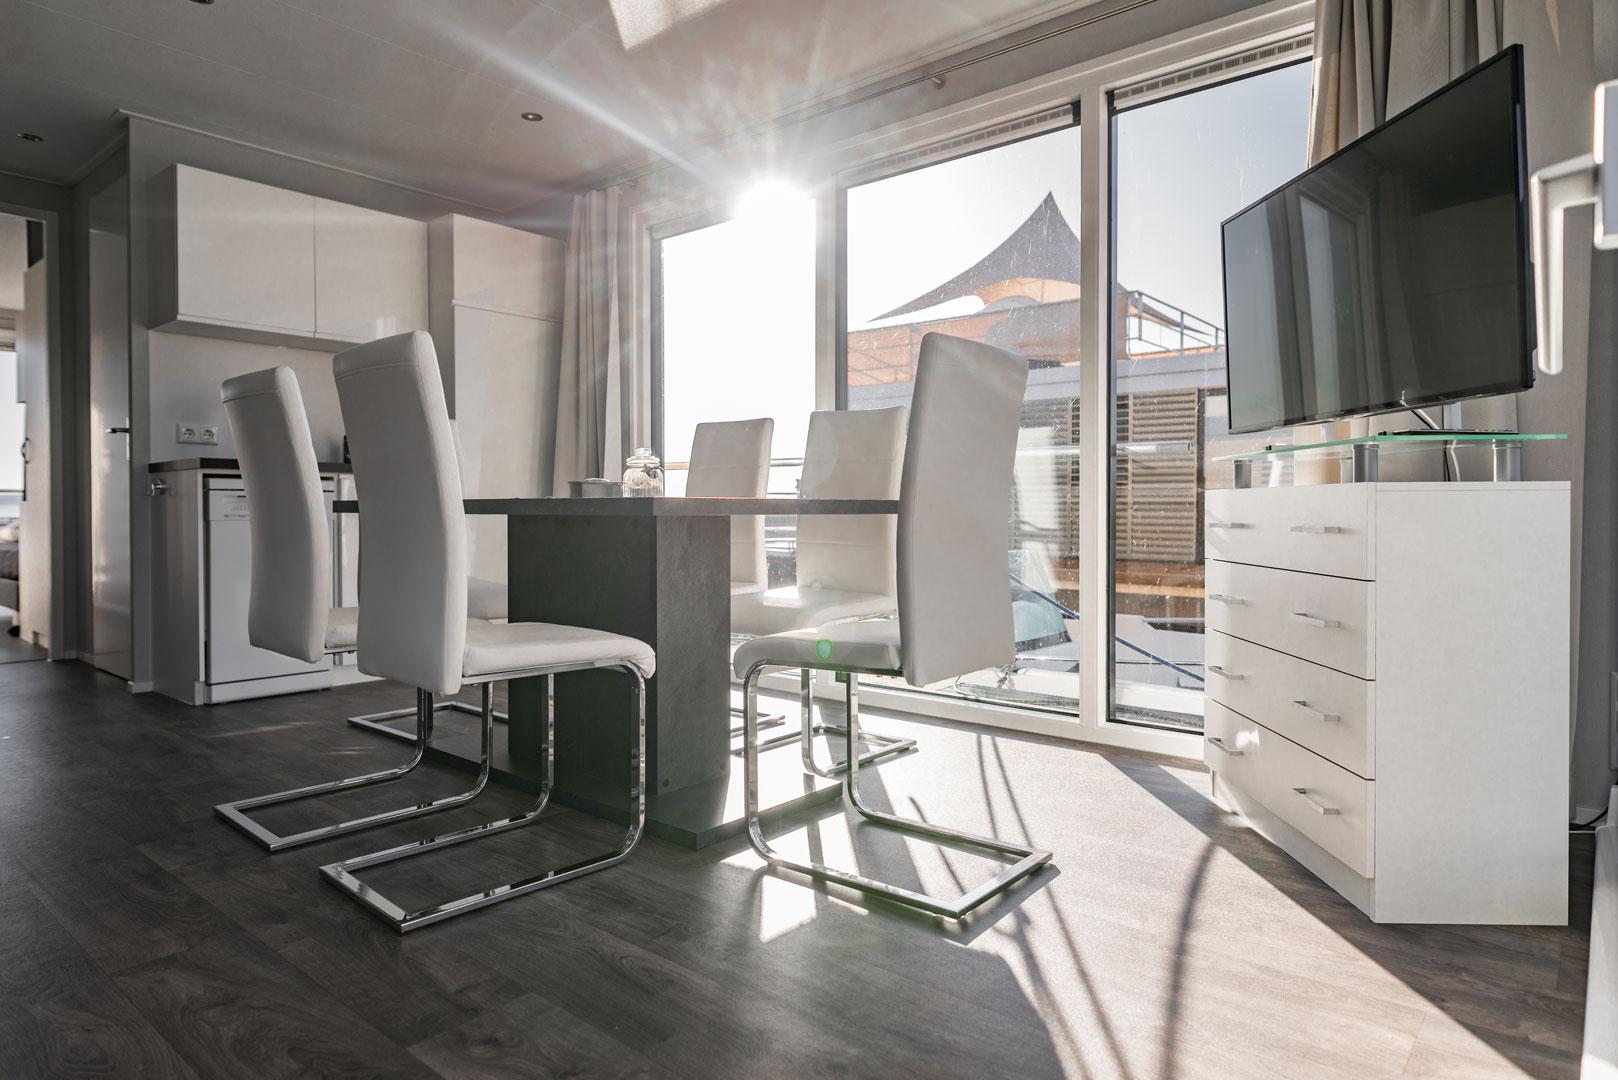 spreewald hausboot mieten m we 2. Black Bedroom Furniture Sets. Home Design Ideas